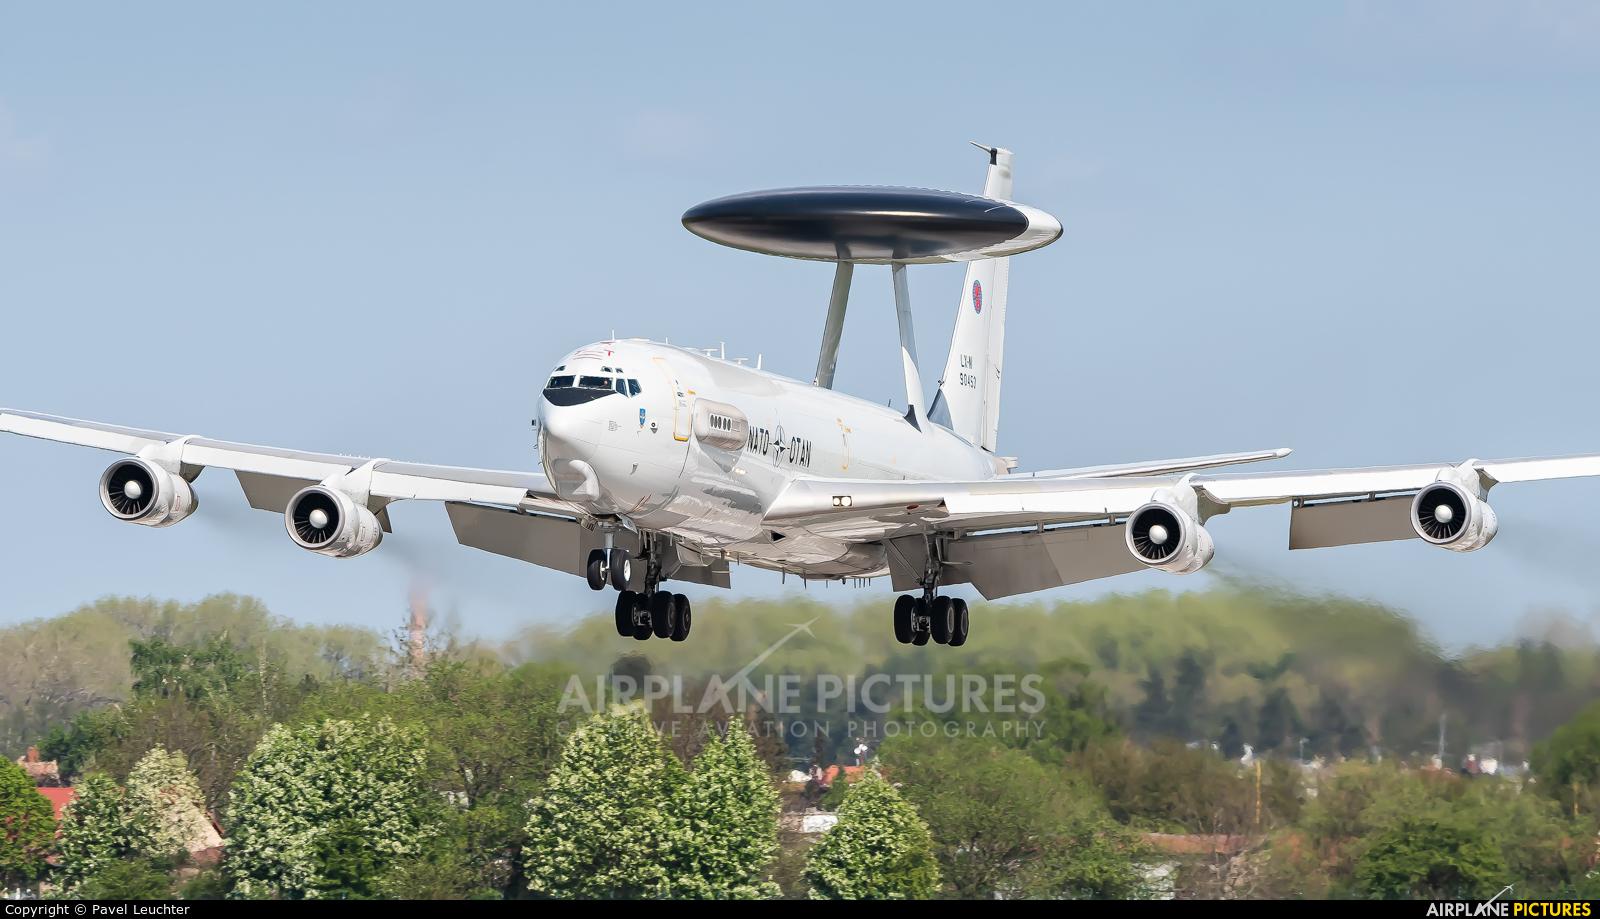 NATO LX-N90453 aircraft at Pardubice